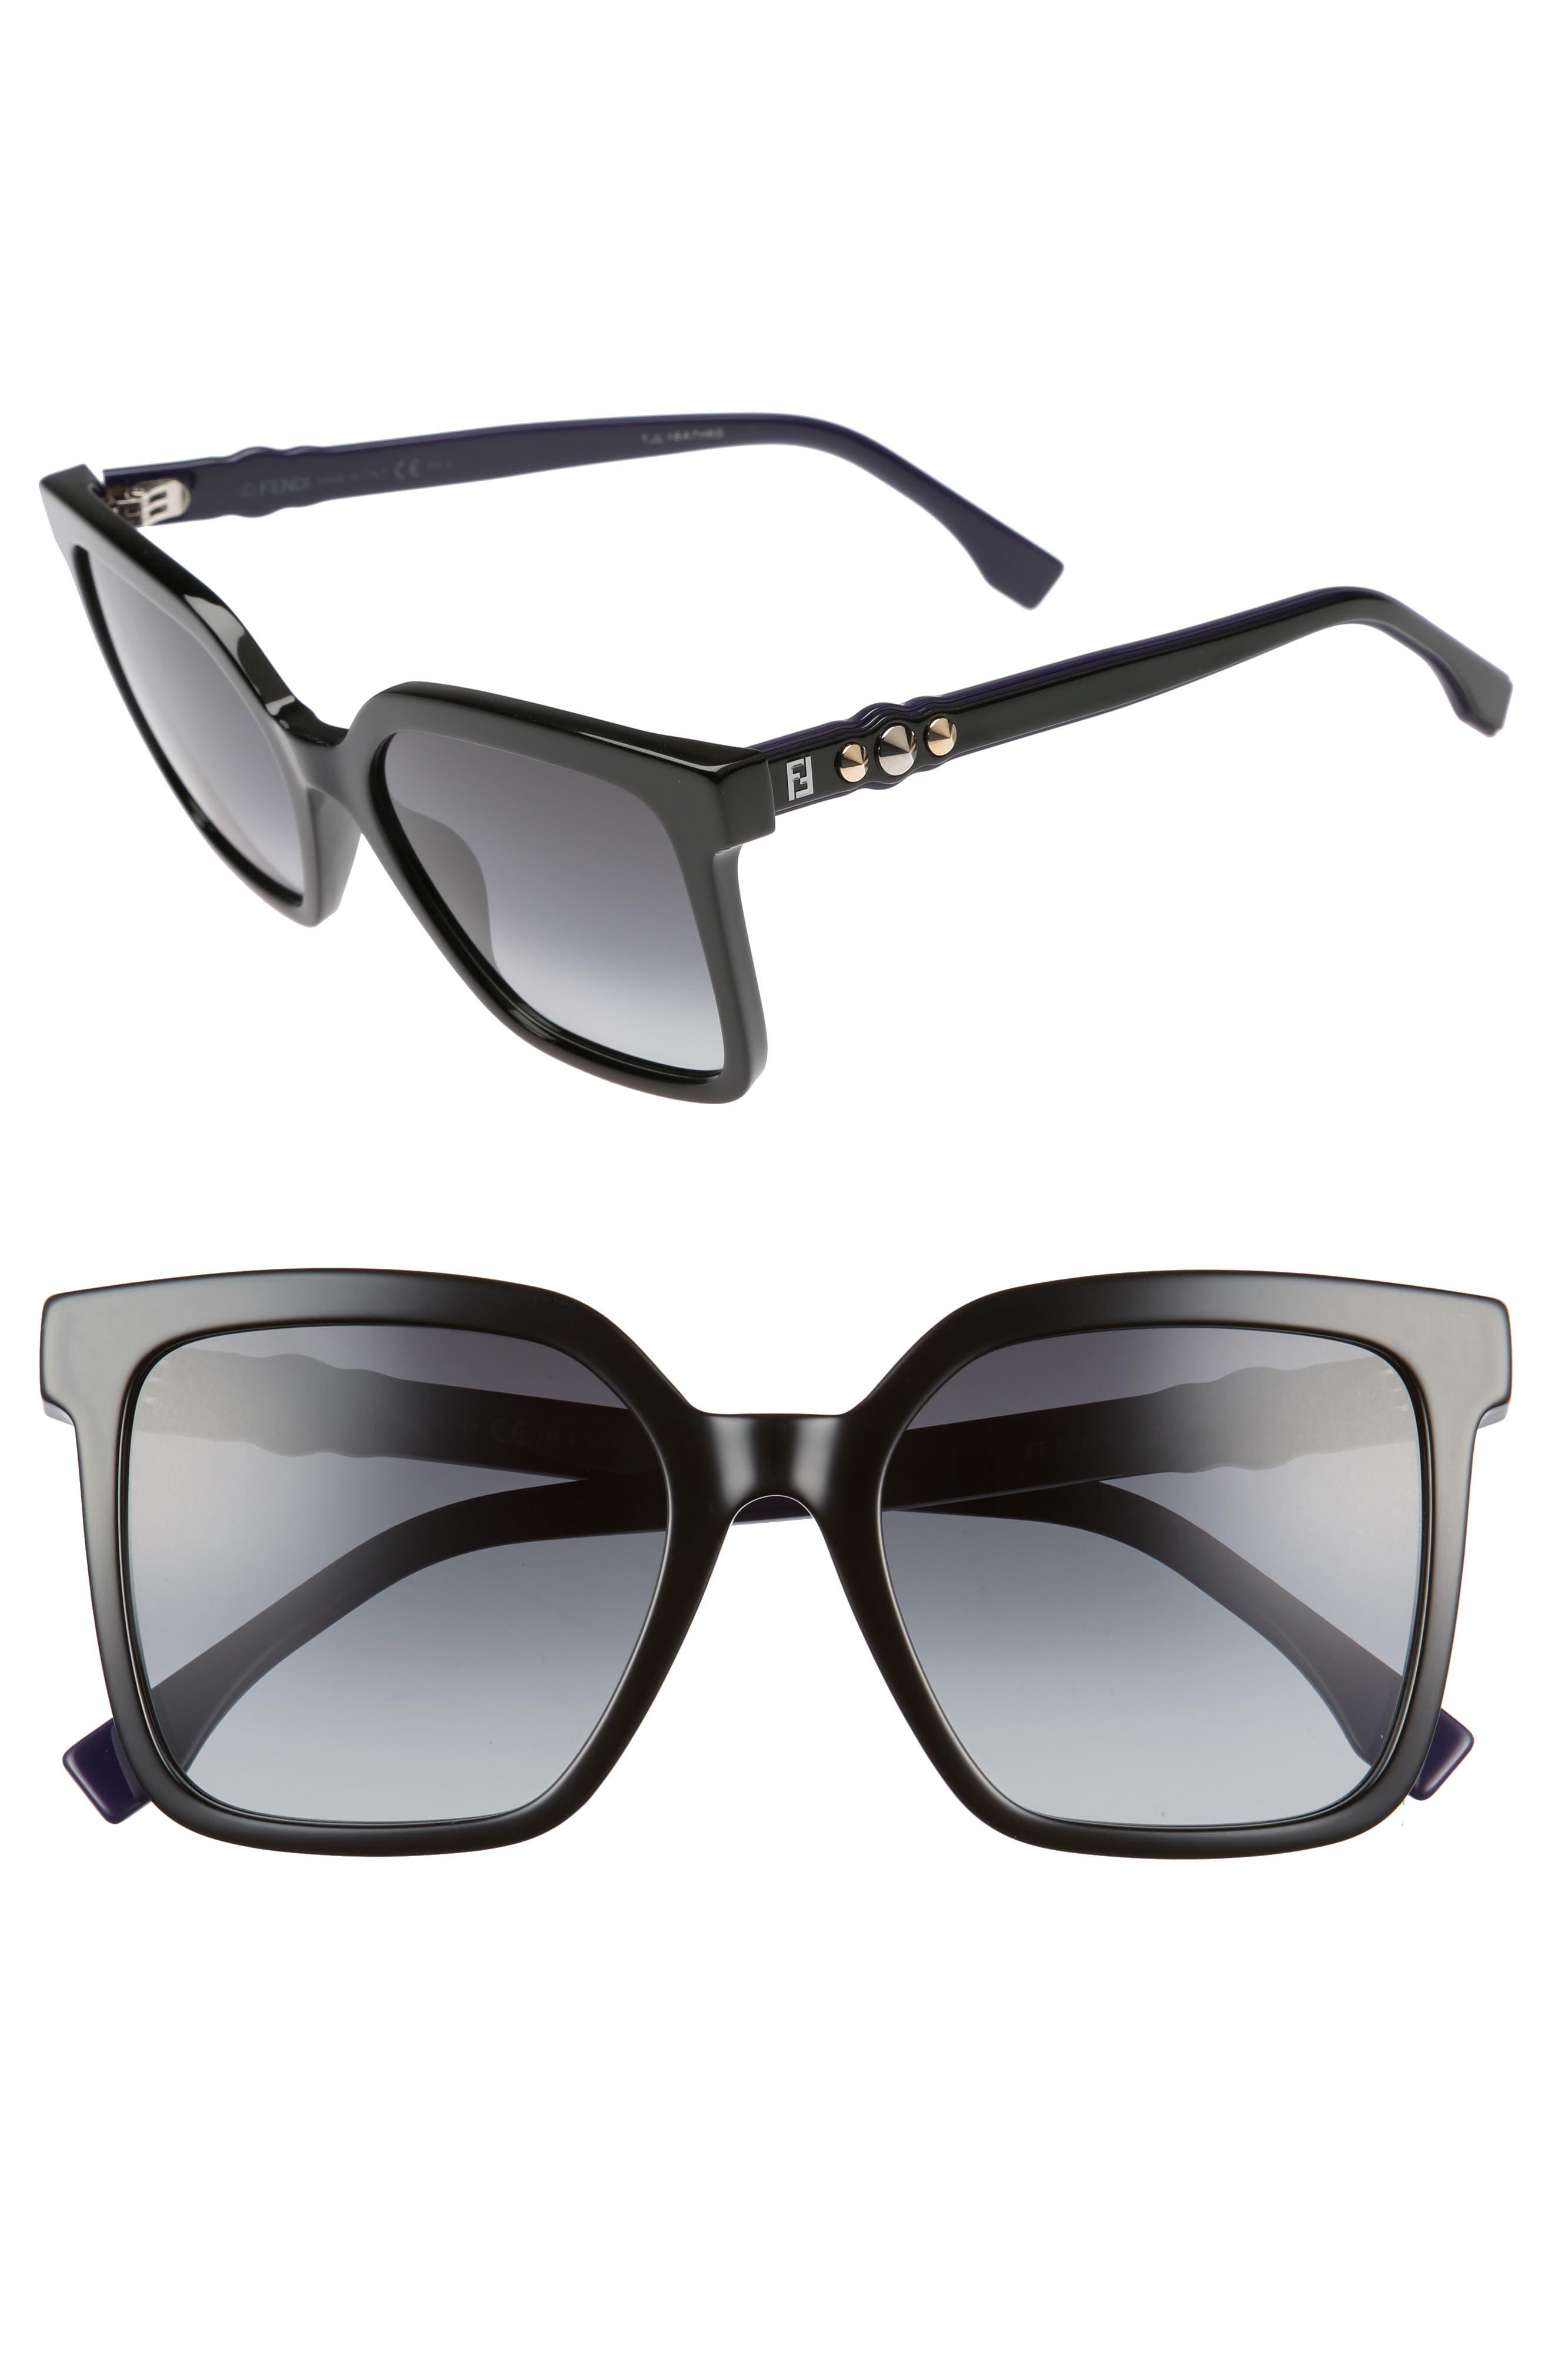 Main Image - Fendi 54mm Square Sunglasses